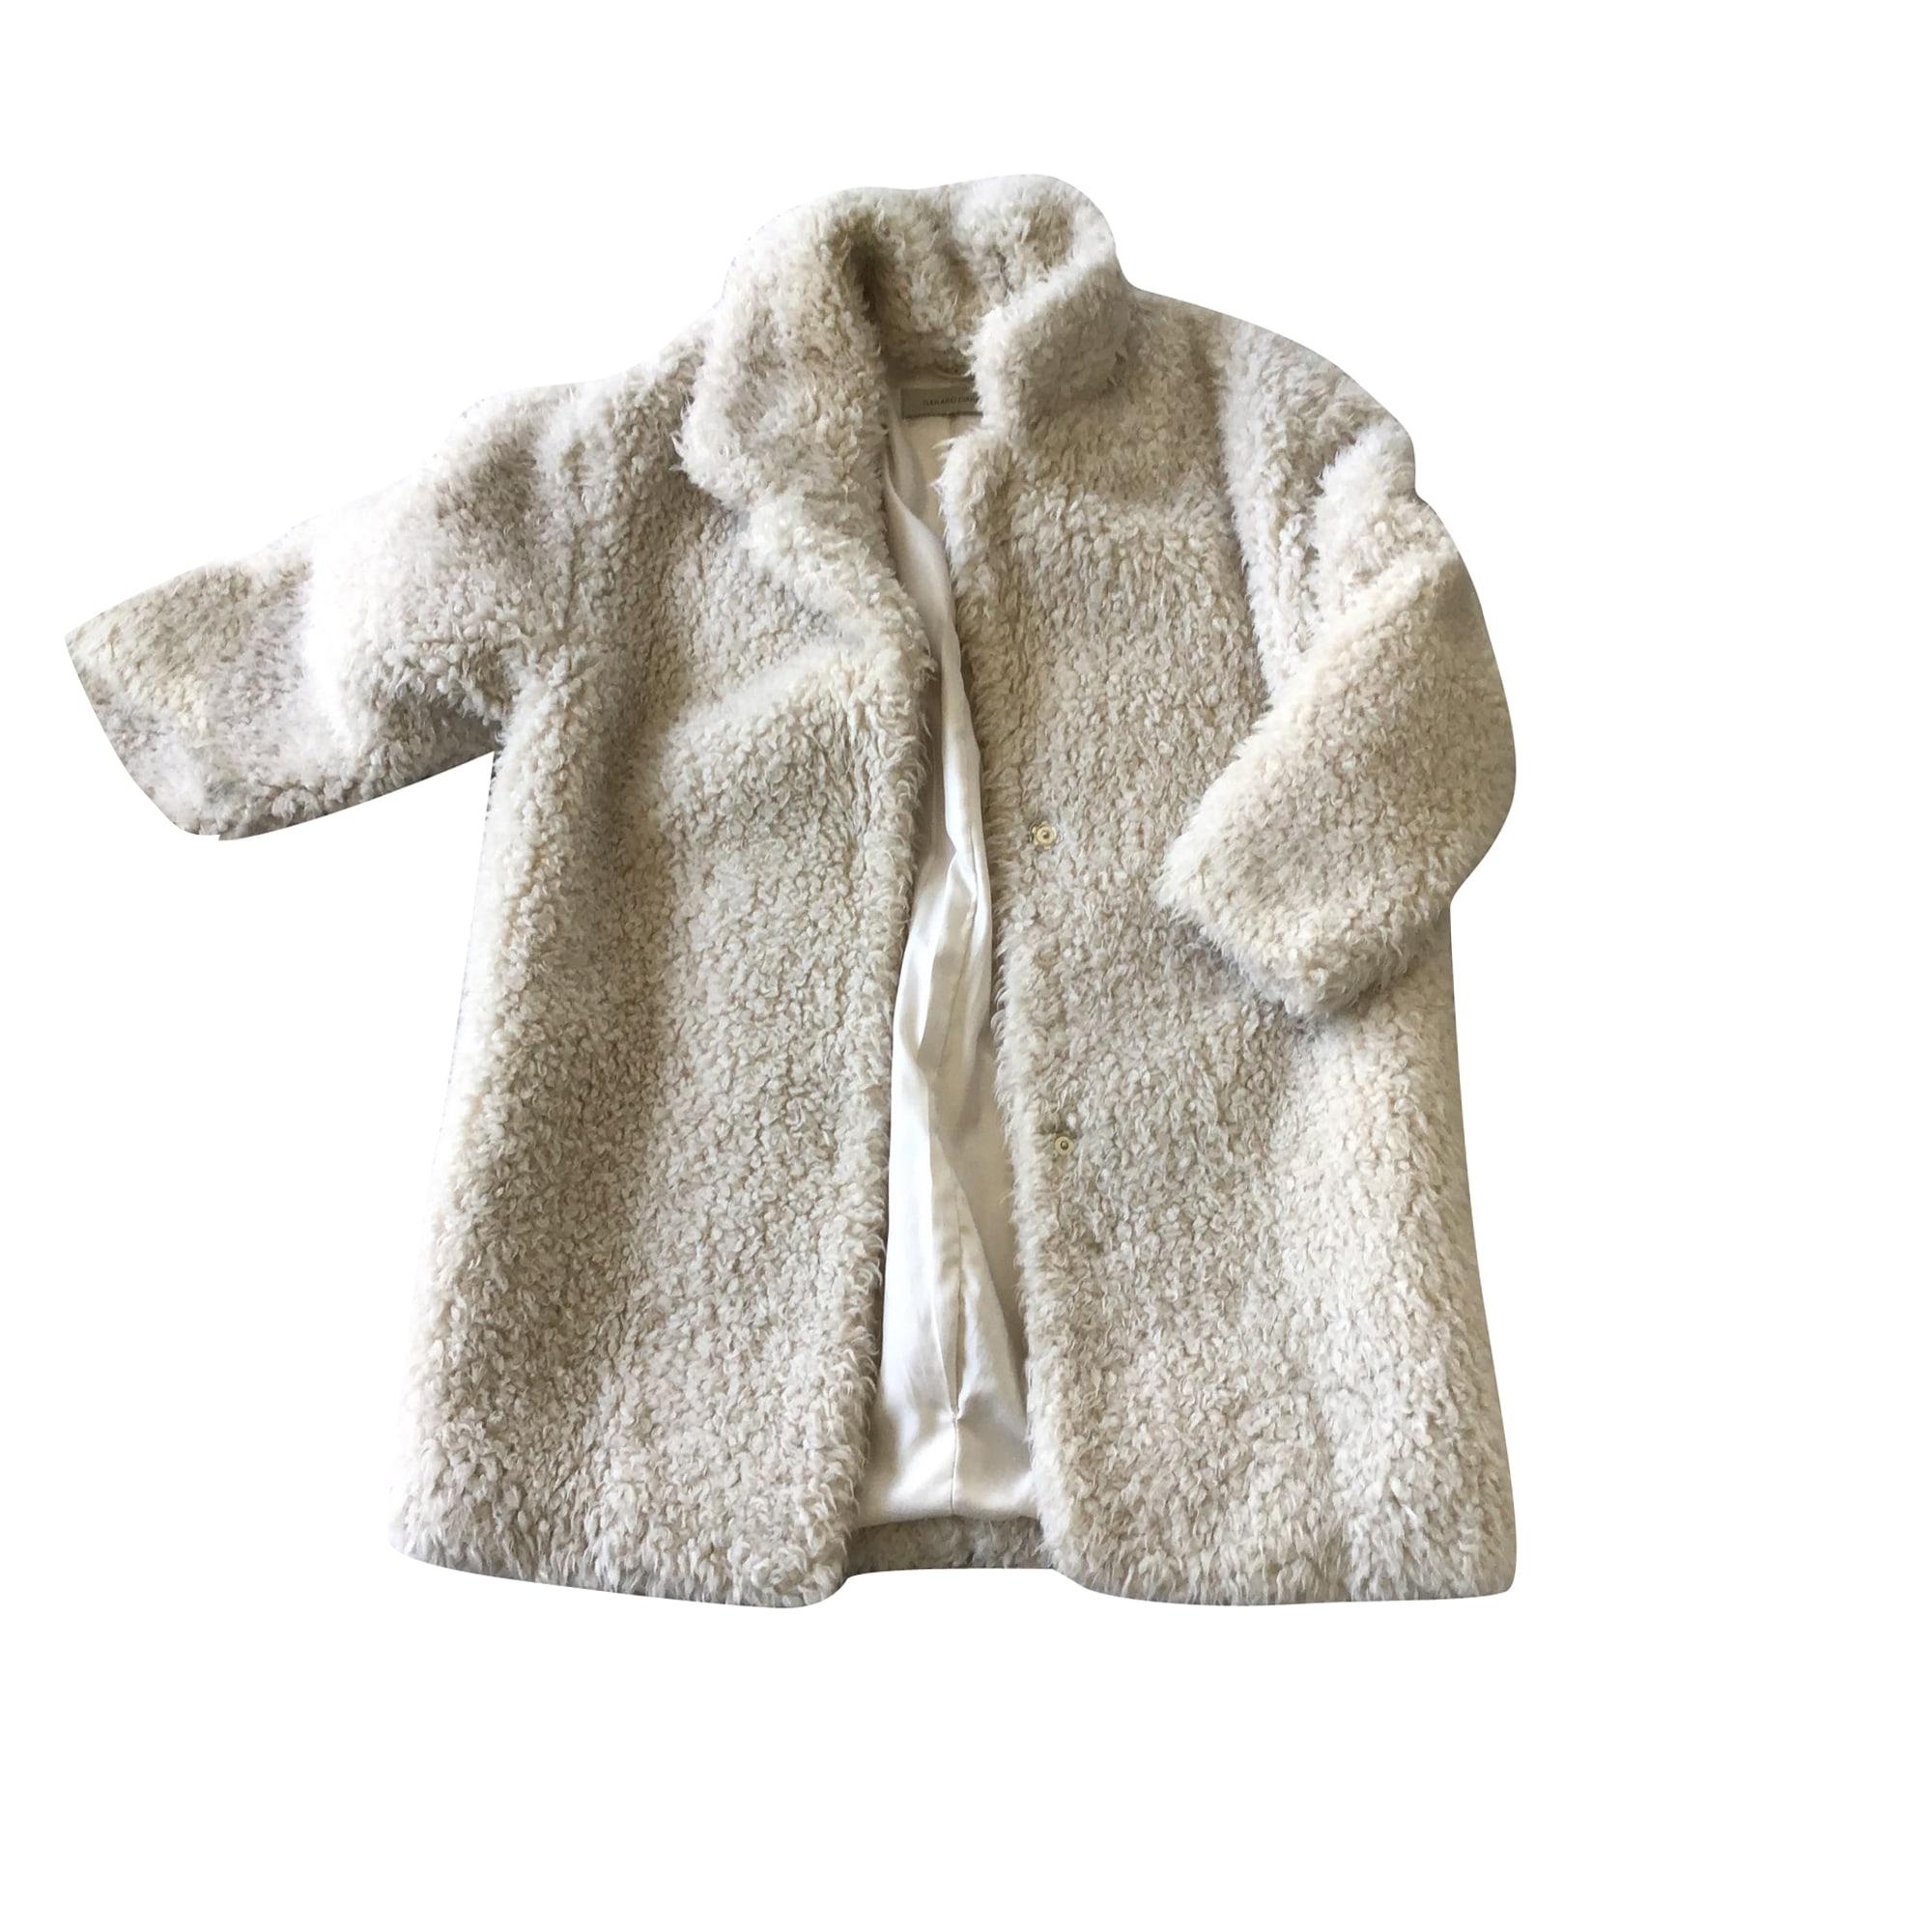 Manteau GERARD DAREL Blanc, blanc cassé, écru